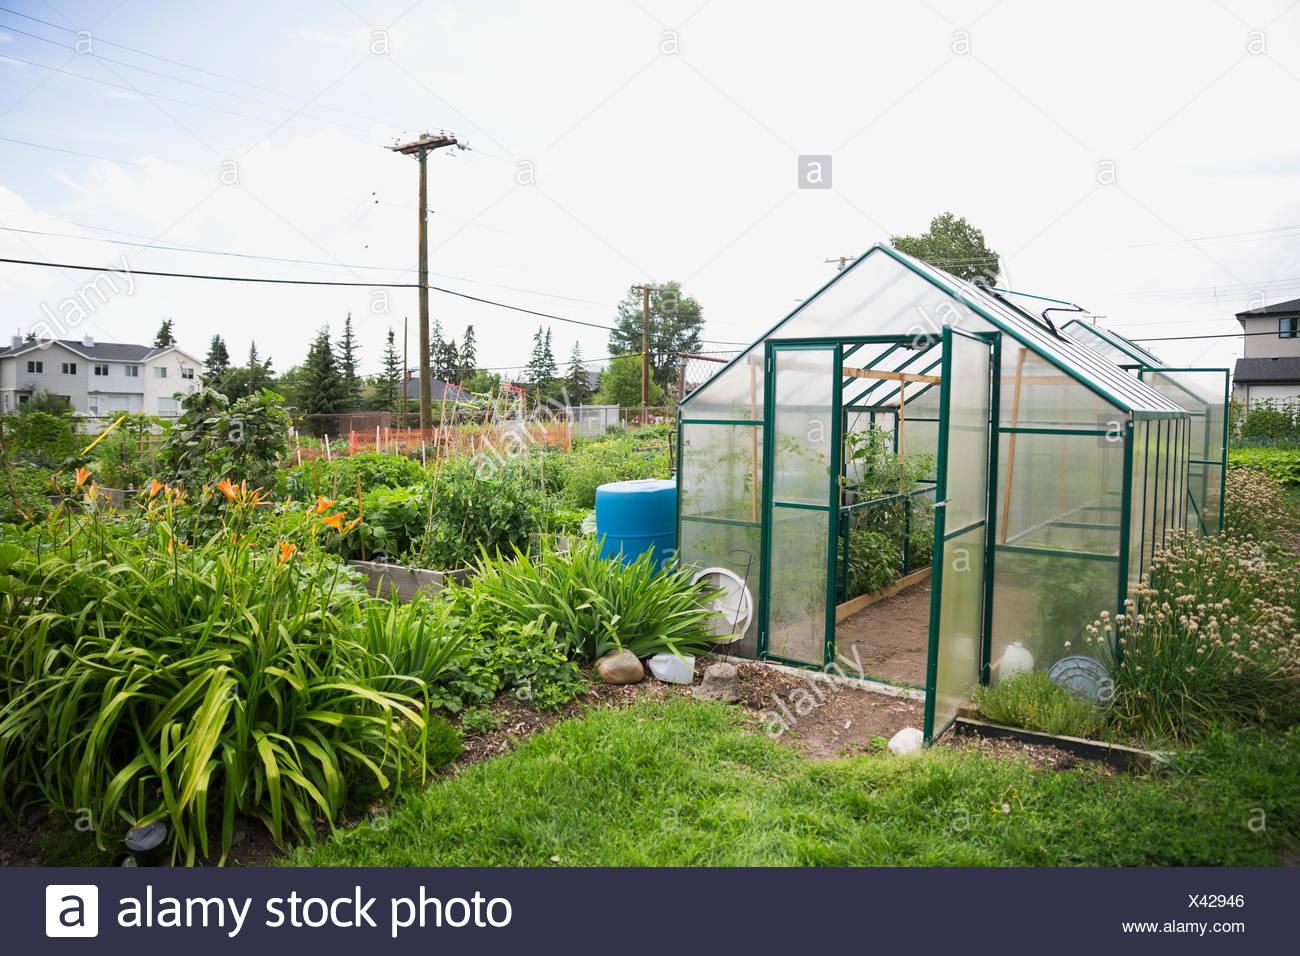 Greenhouse in community garden - Stock Image